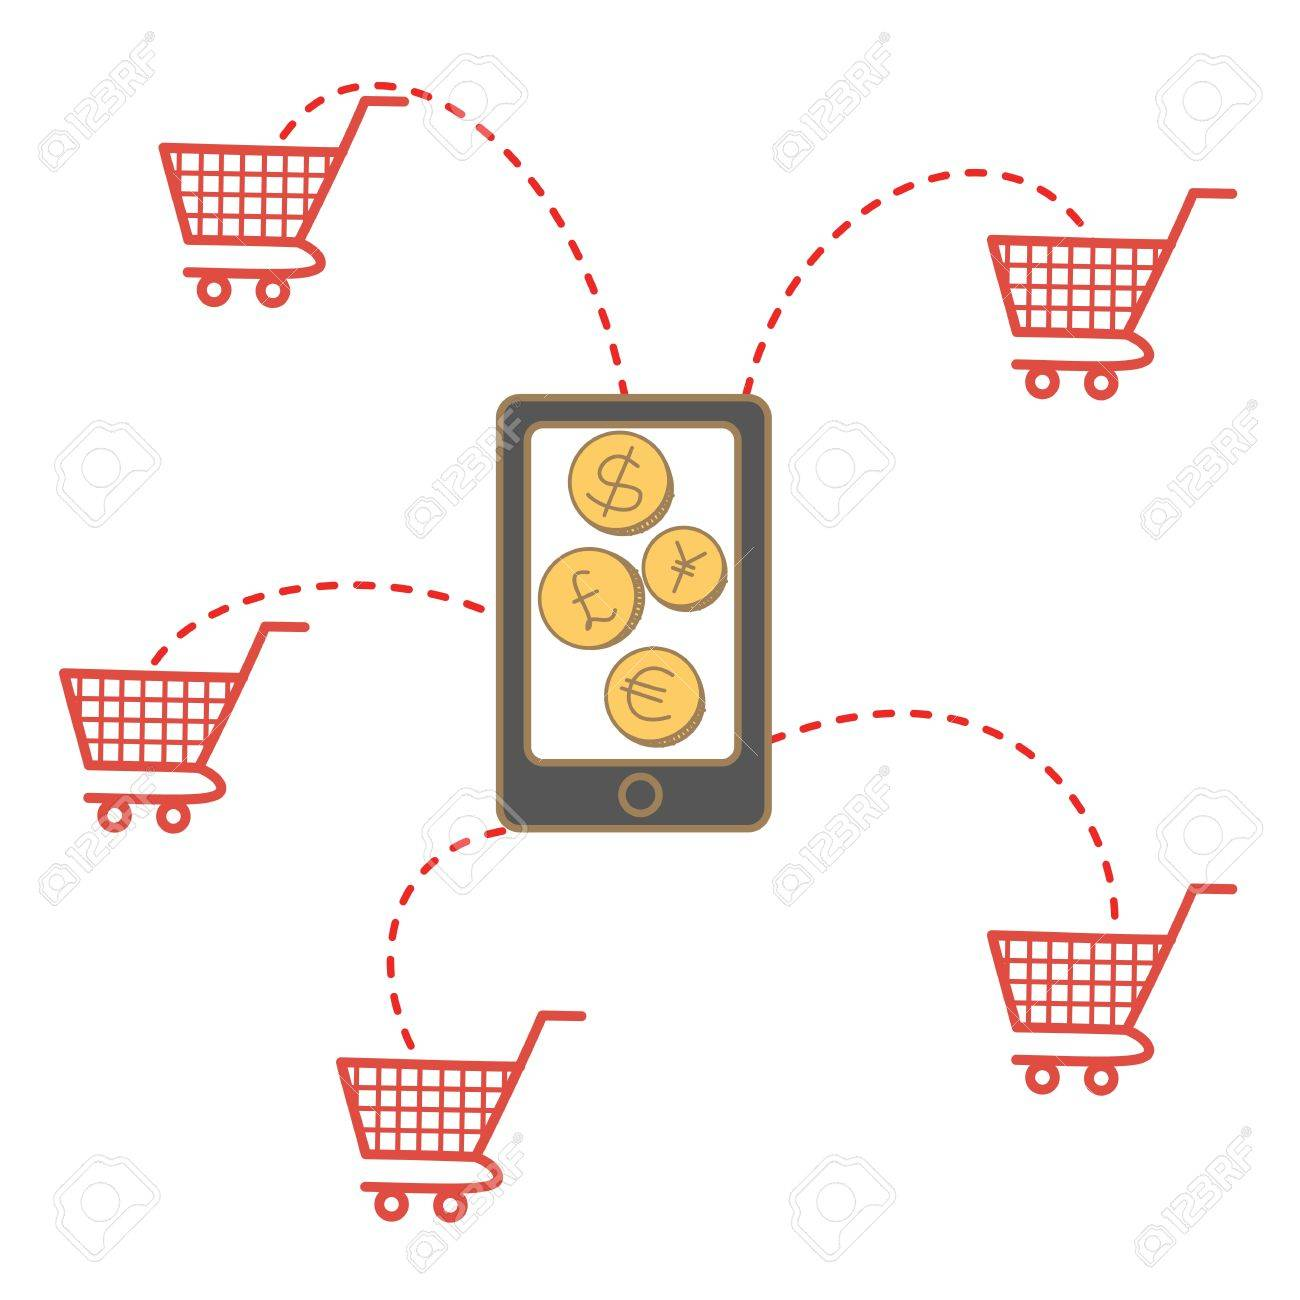 cartoon drawing of shopping via mobile Stock Vector - 17414601